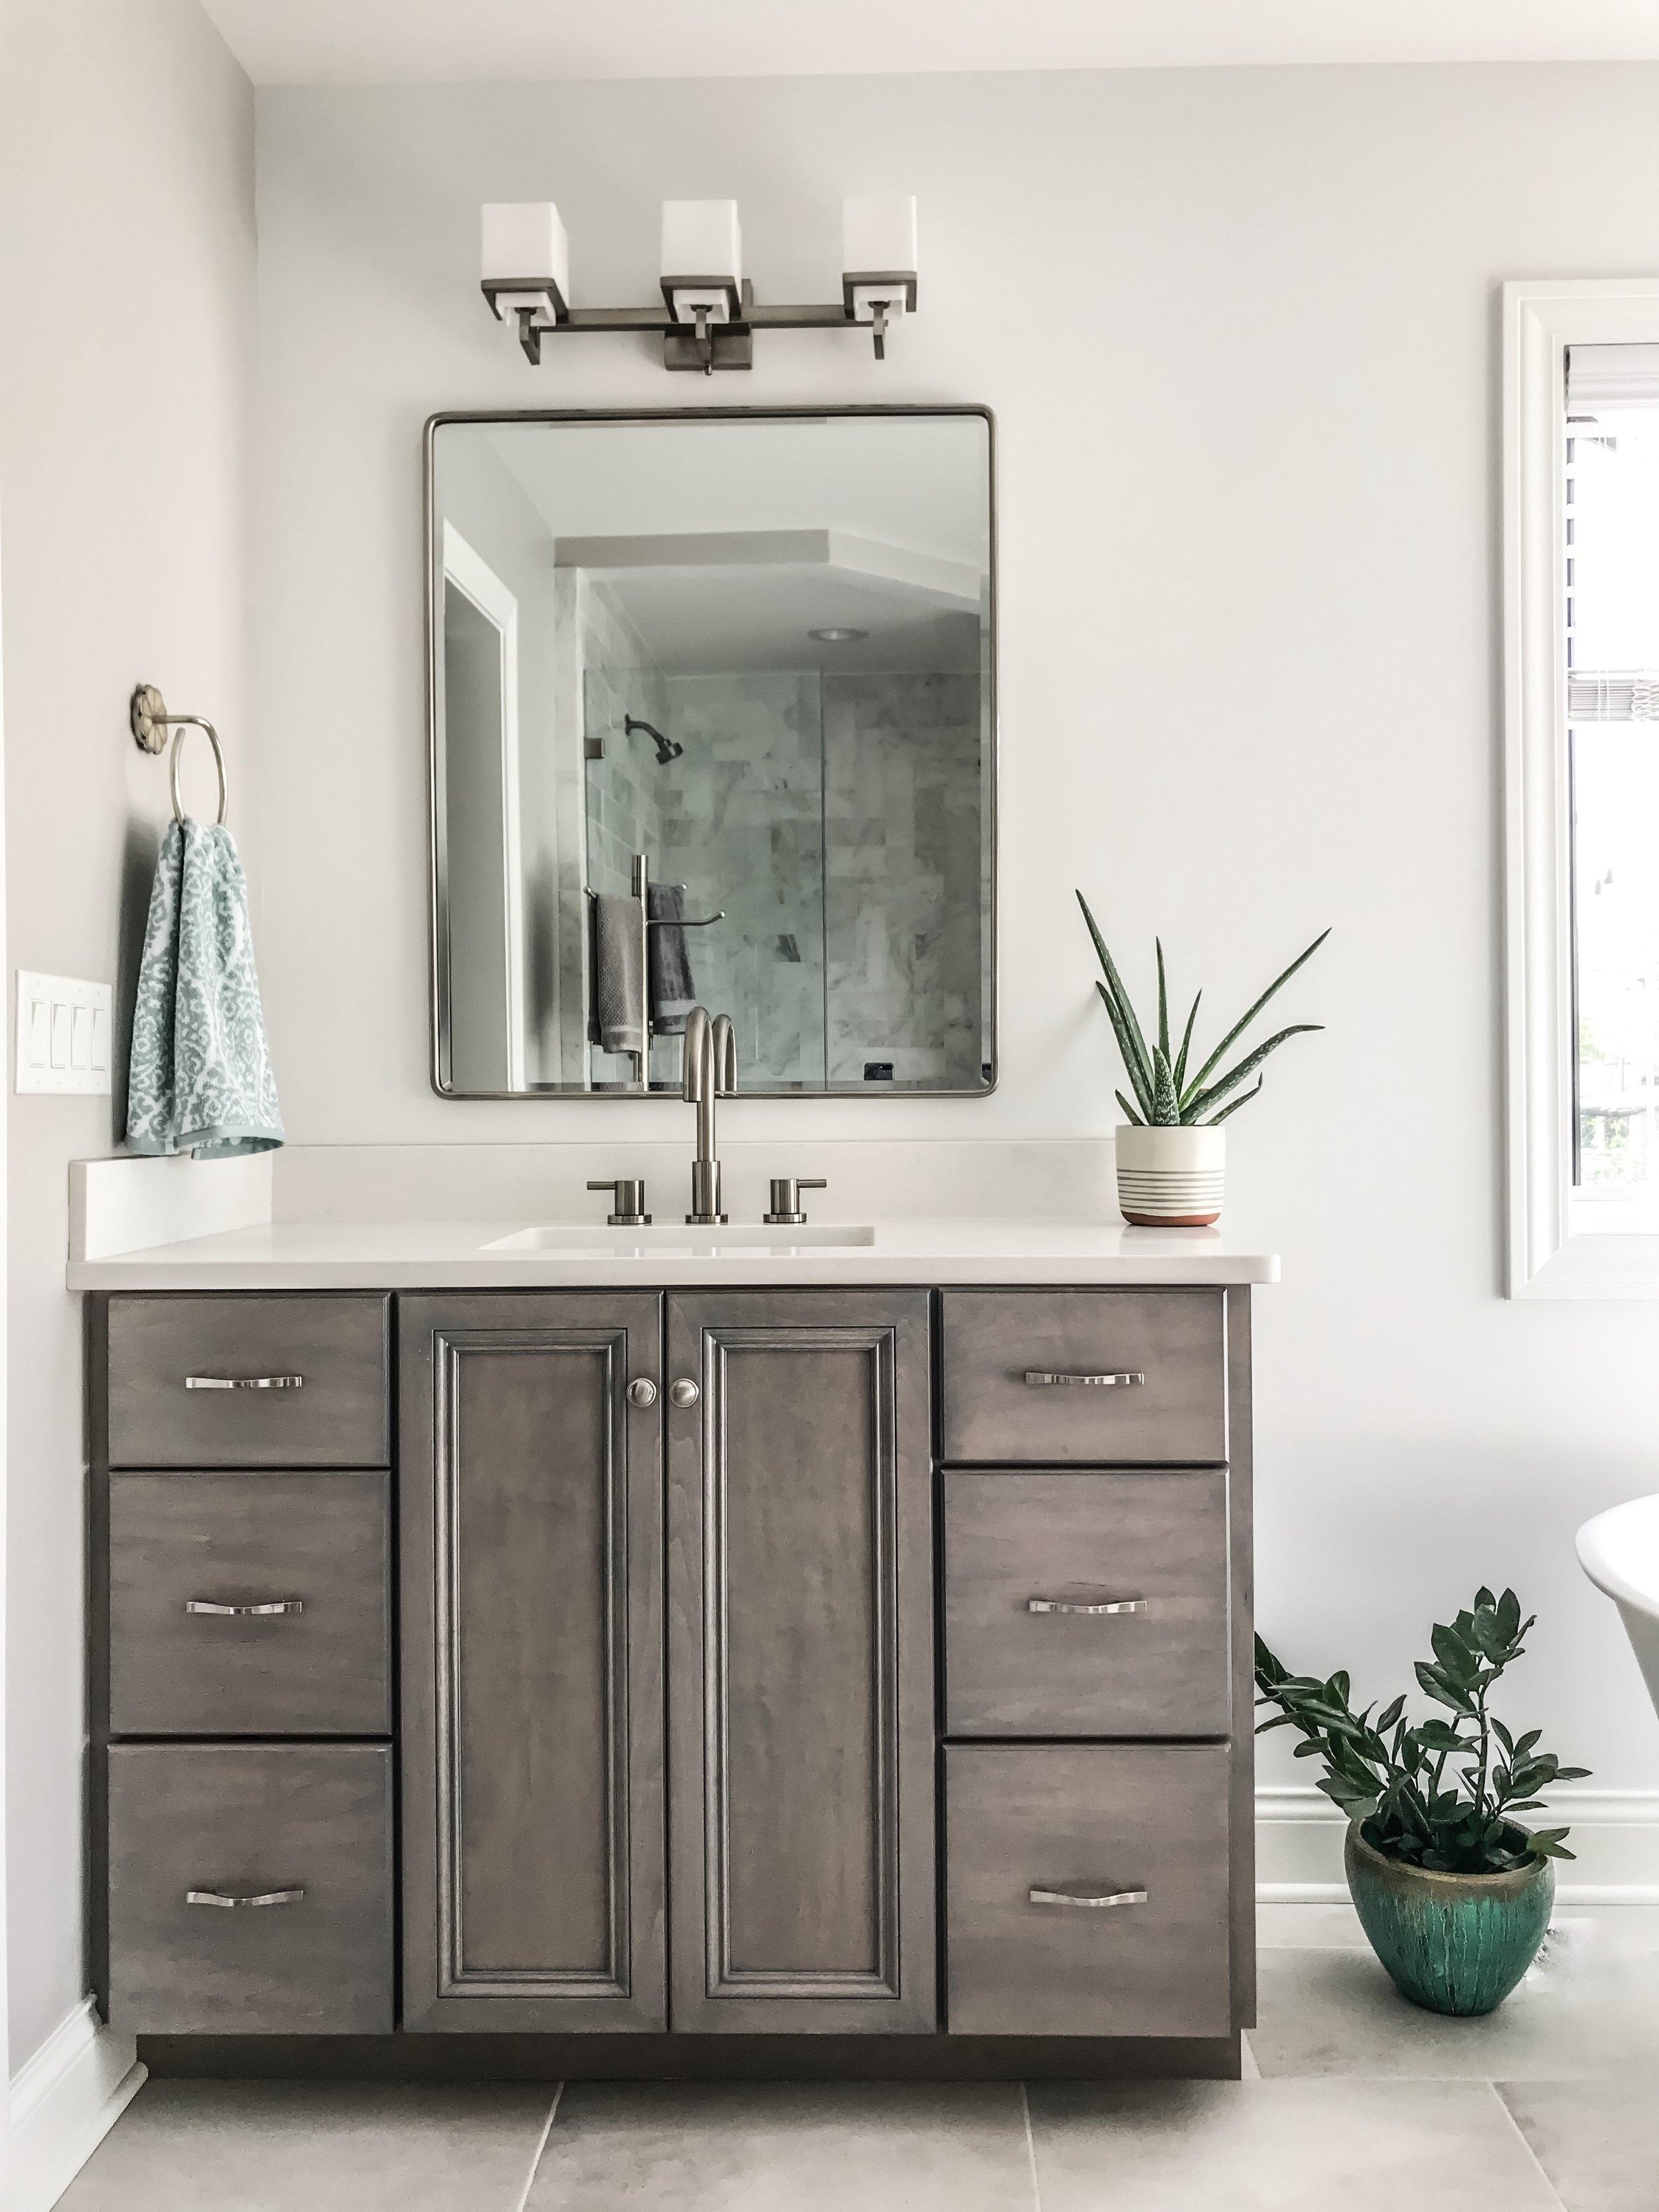 Modern Bathroom Vanity Ideas. Modern Bathroom Design. Bathroom mirrors. Gray Master Bathroom. House plants in bathroom. Freestanding bathtub. #wetstyle #sponsored #bathtub #vanity #mirrors